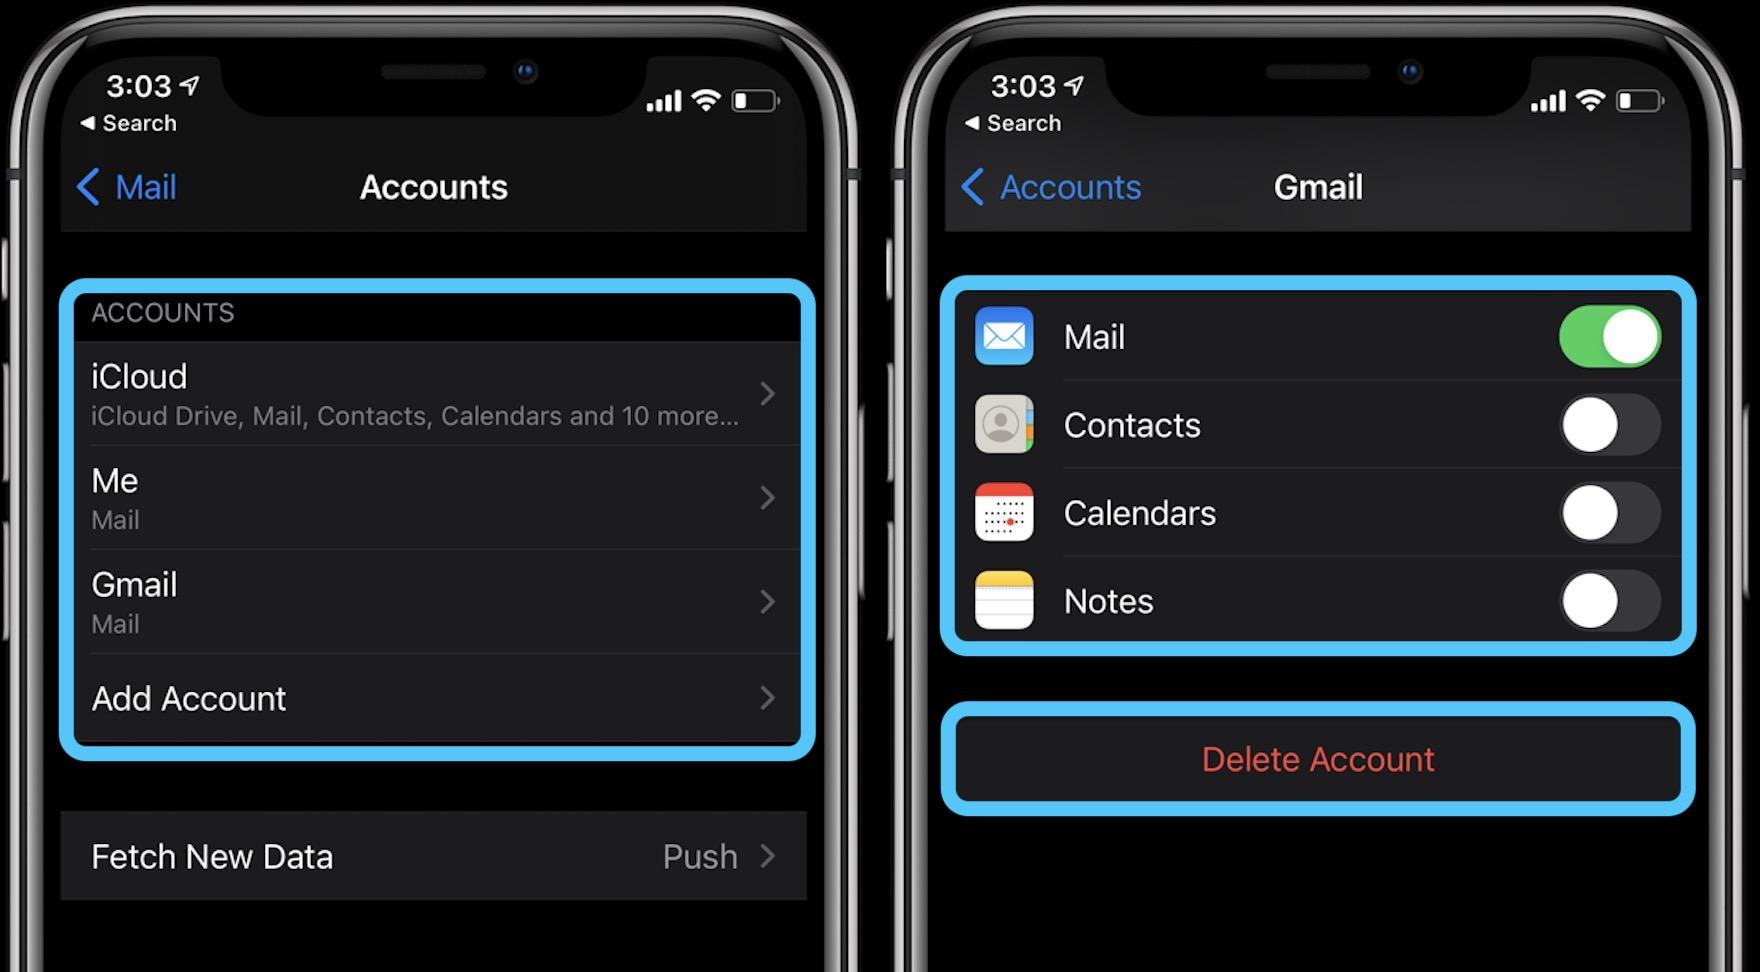 How to add edit iPhone accounts in iOS 14 walkthrough 2